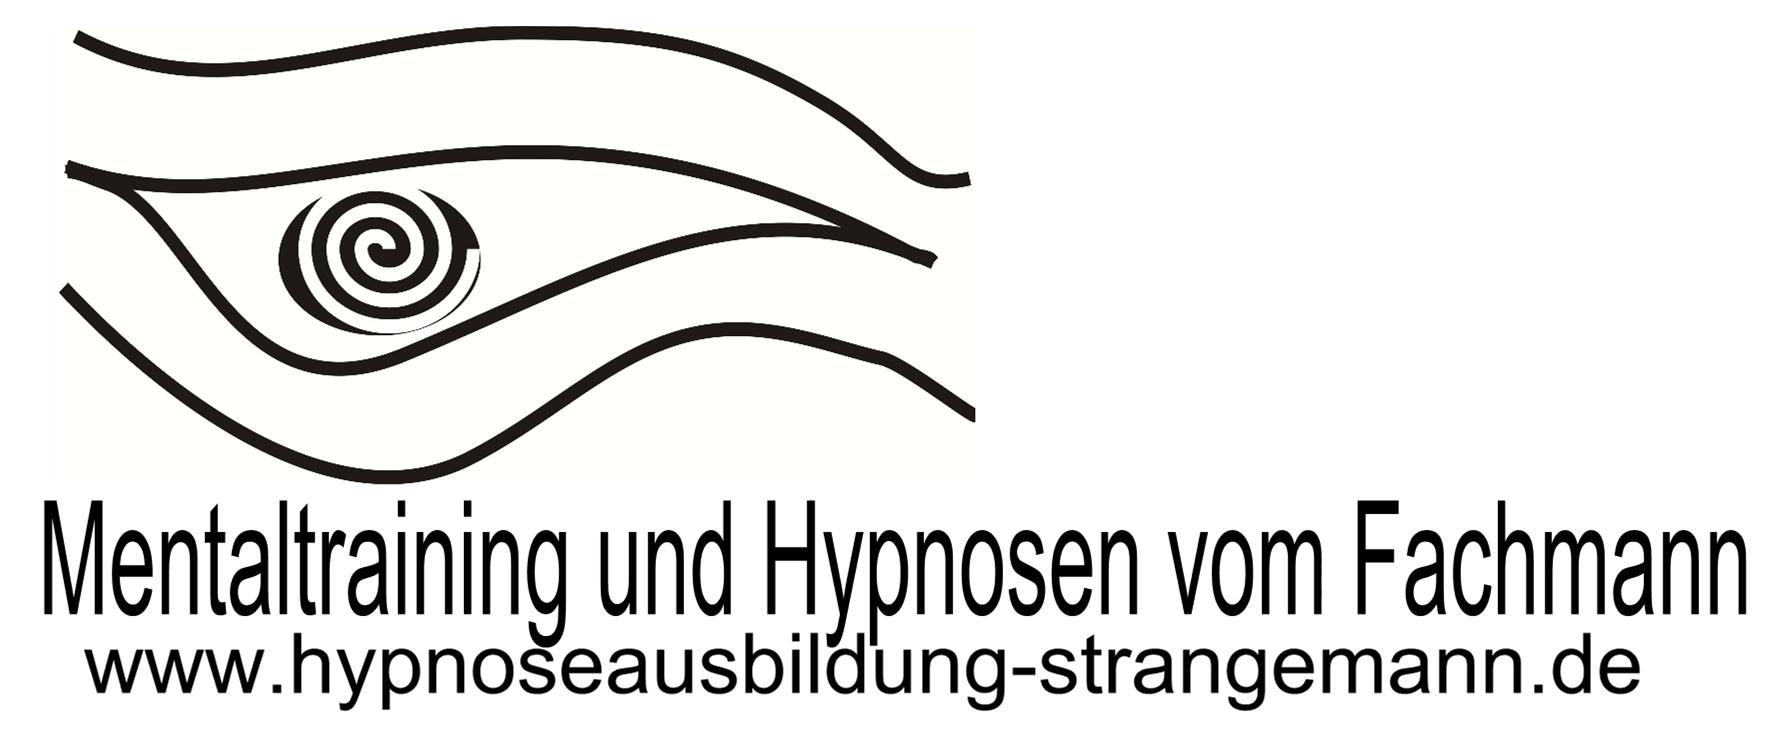 Hypnoseausbildung UNABHÄNGIG, INNOVATIV, LÖSUNGSORIENTIERT